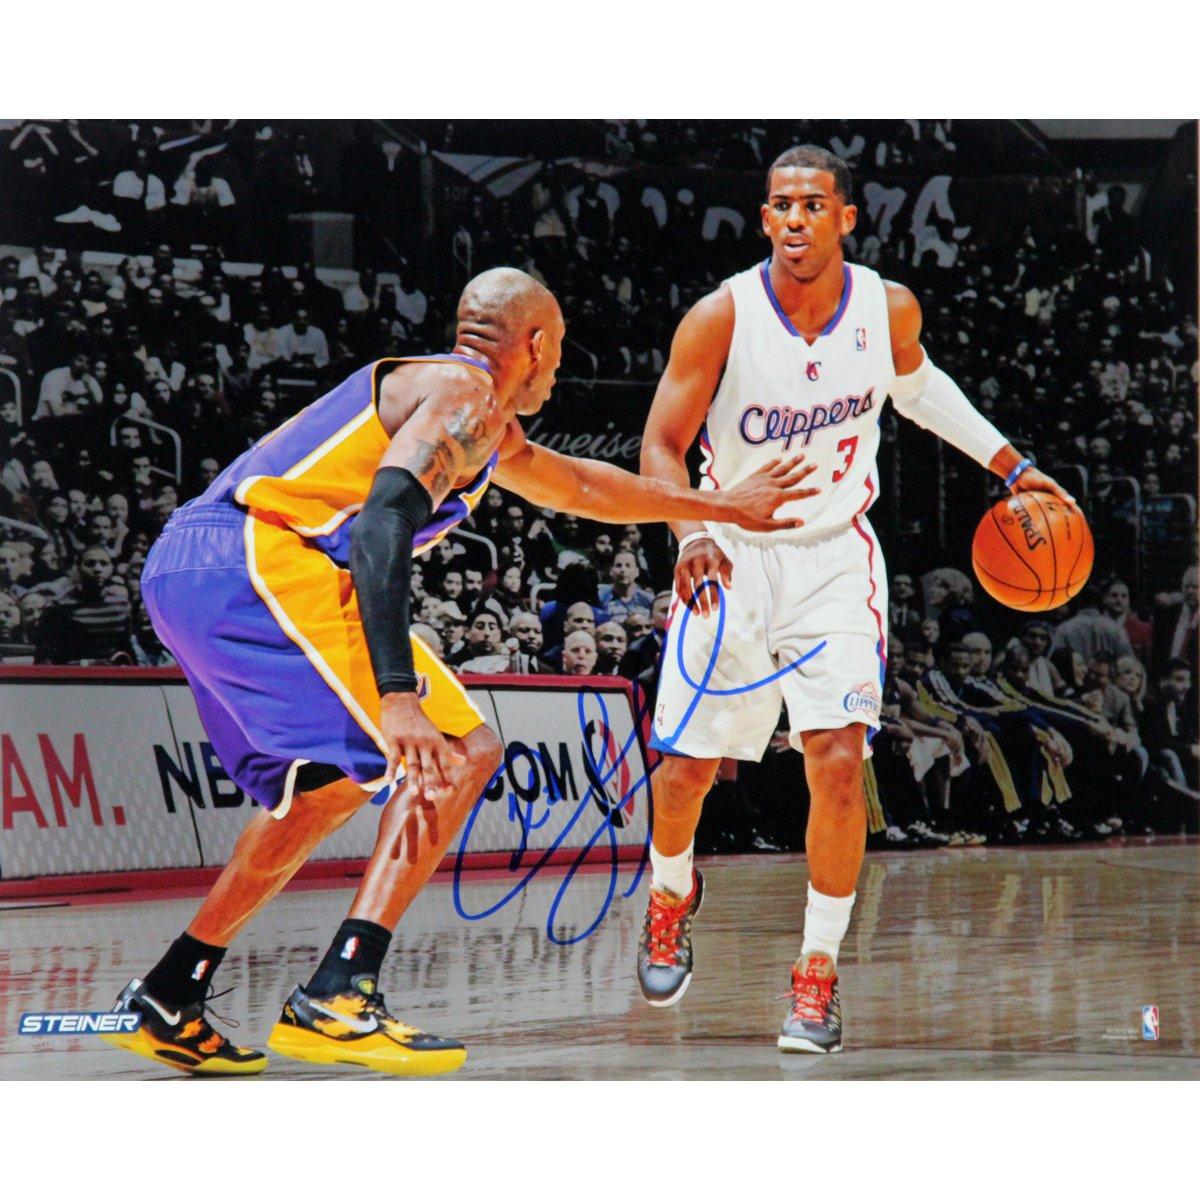 NBA Los Angeles Clippers Chris Paul vs. Kobe Bryant Signed Photo, 8 x 10-Feet